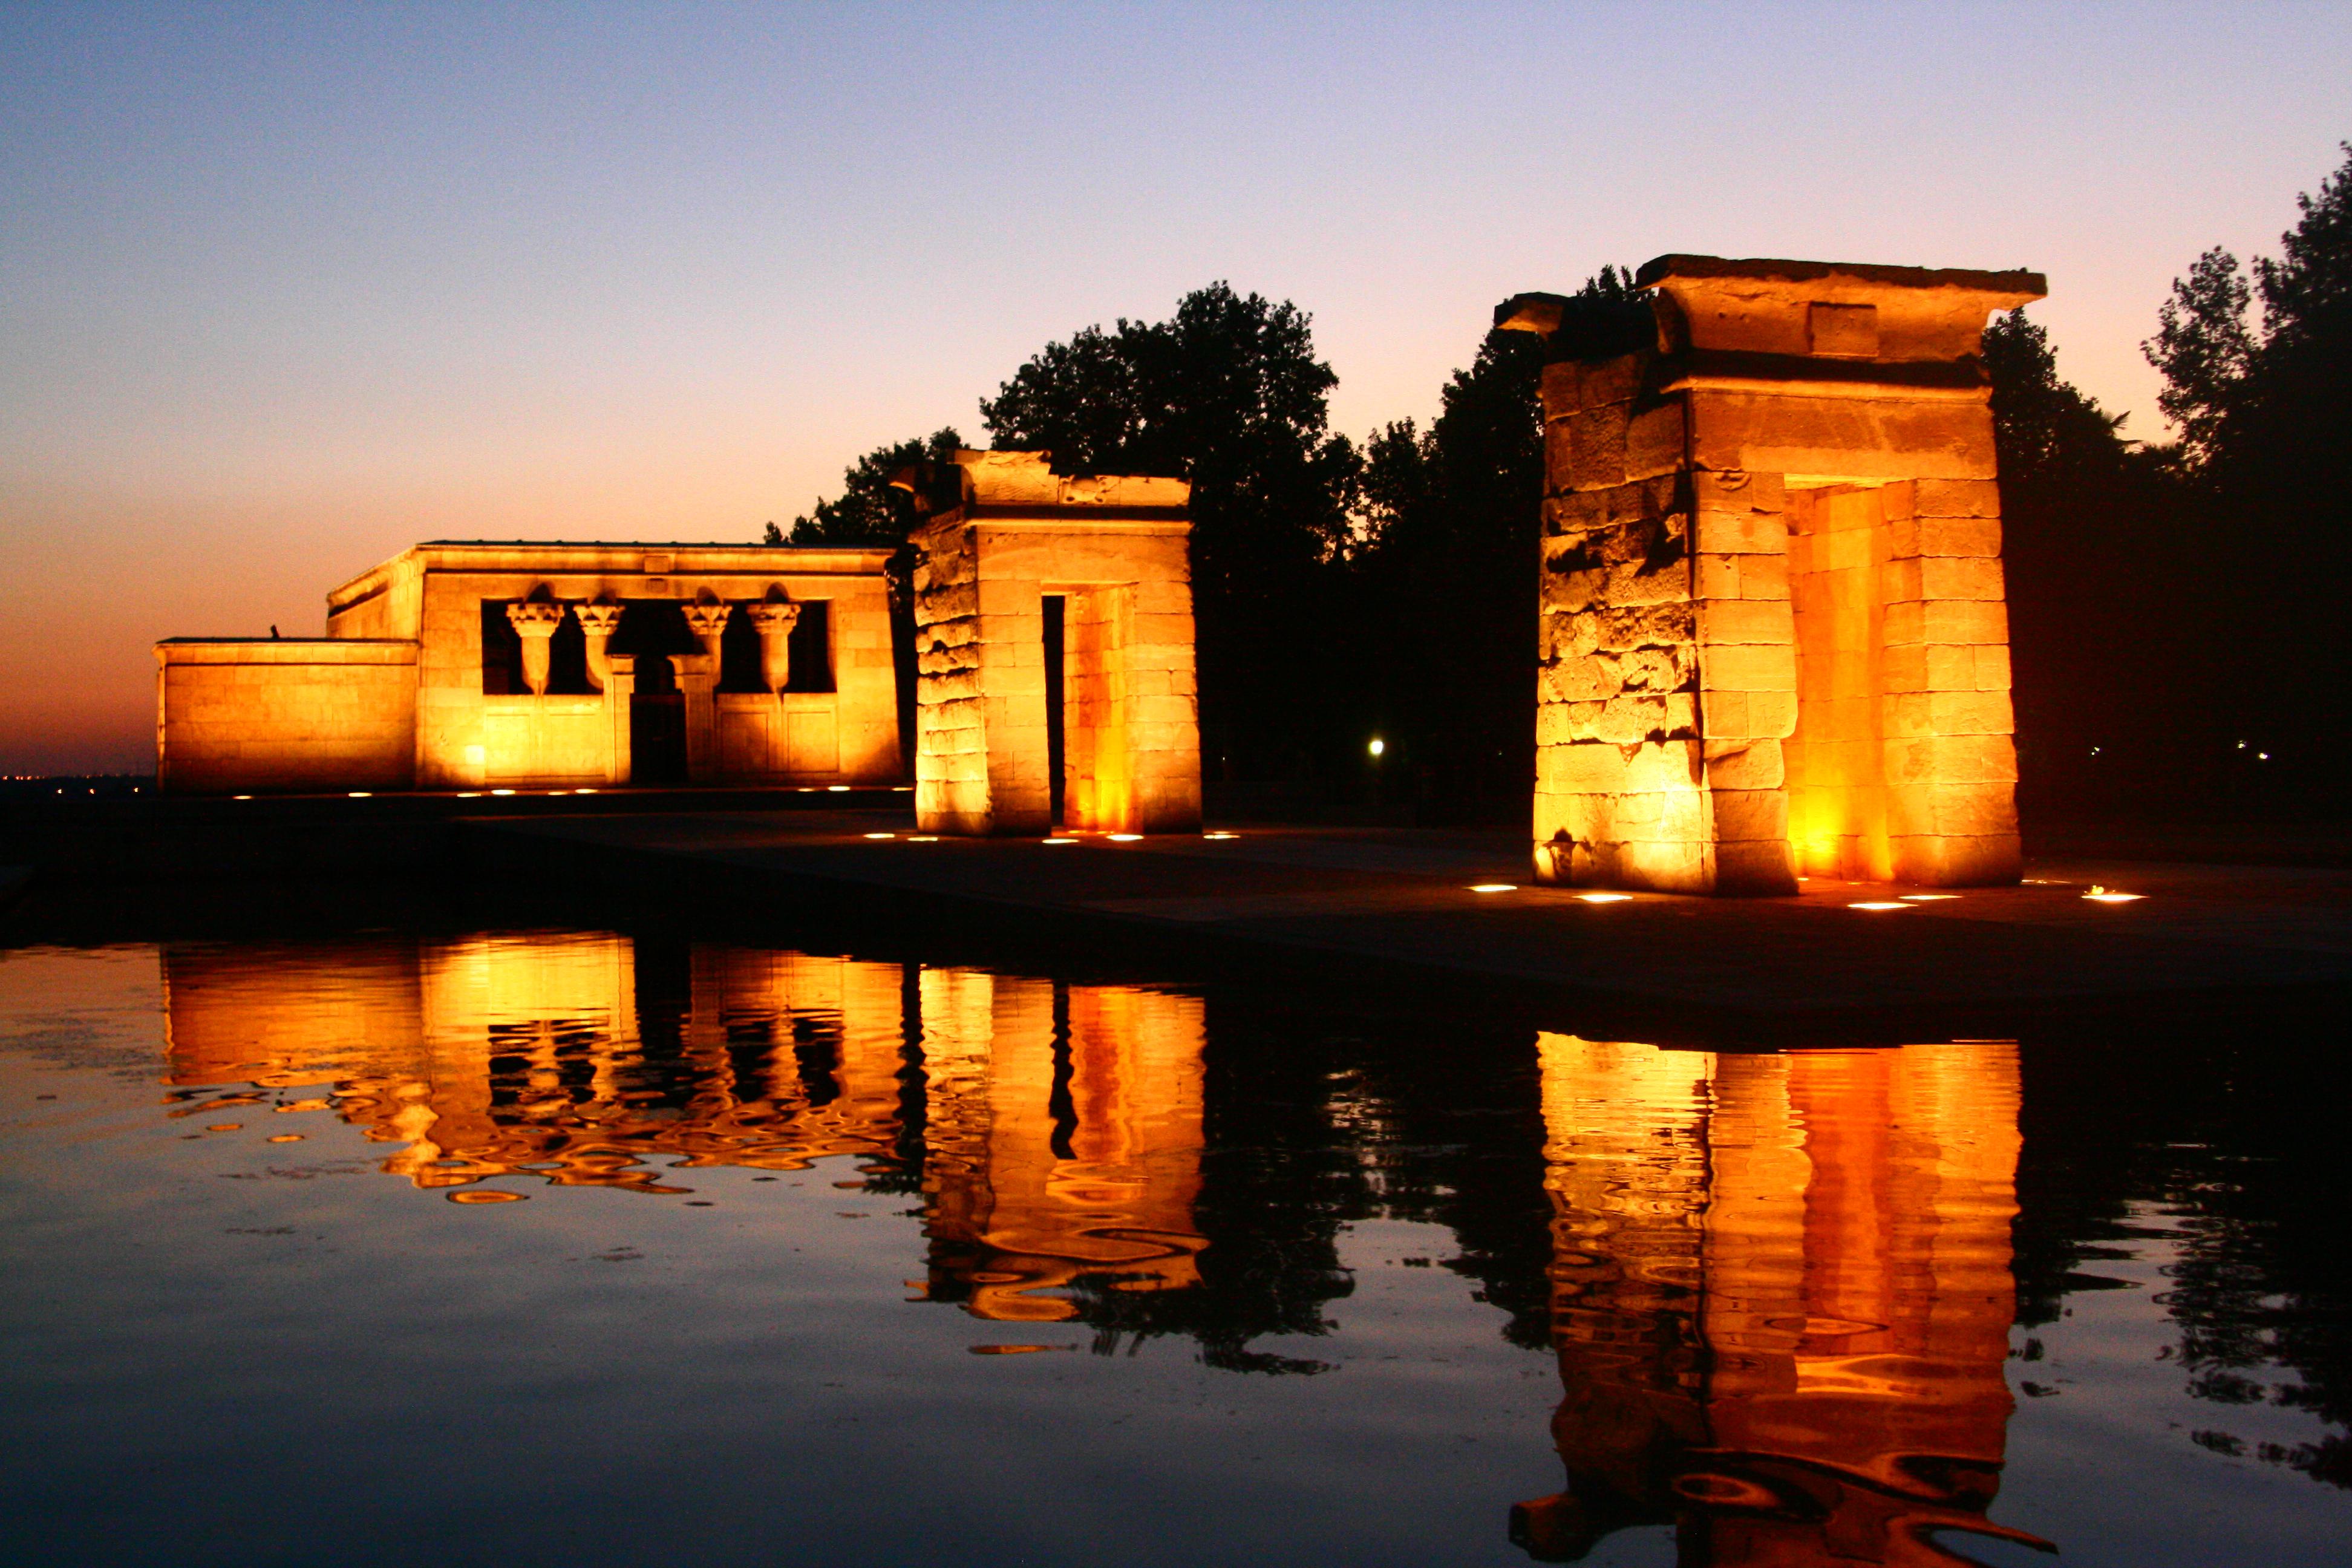 File:Templo de Debod (Madrid) 19.jpg - Wikimedia Commons